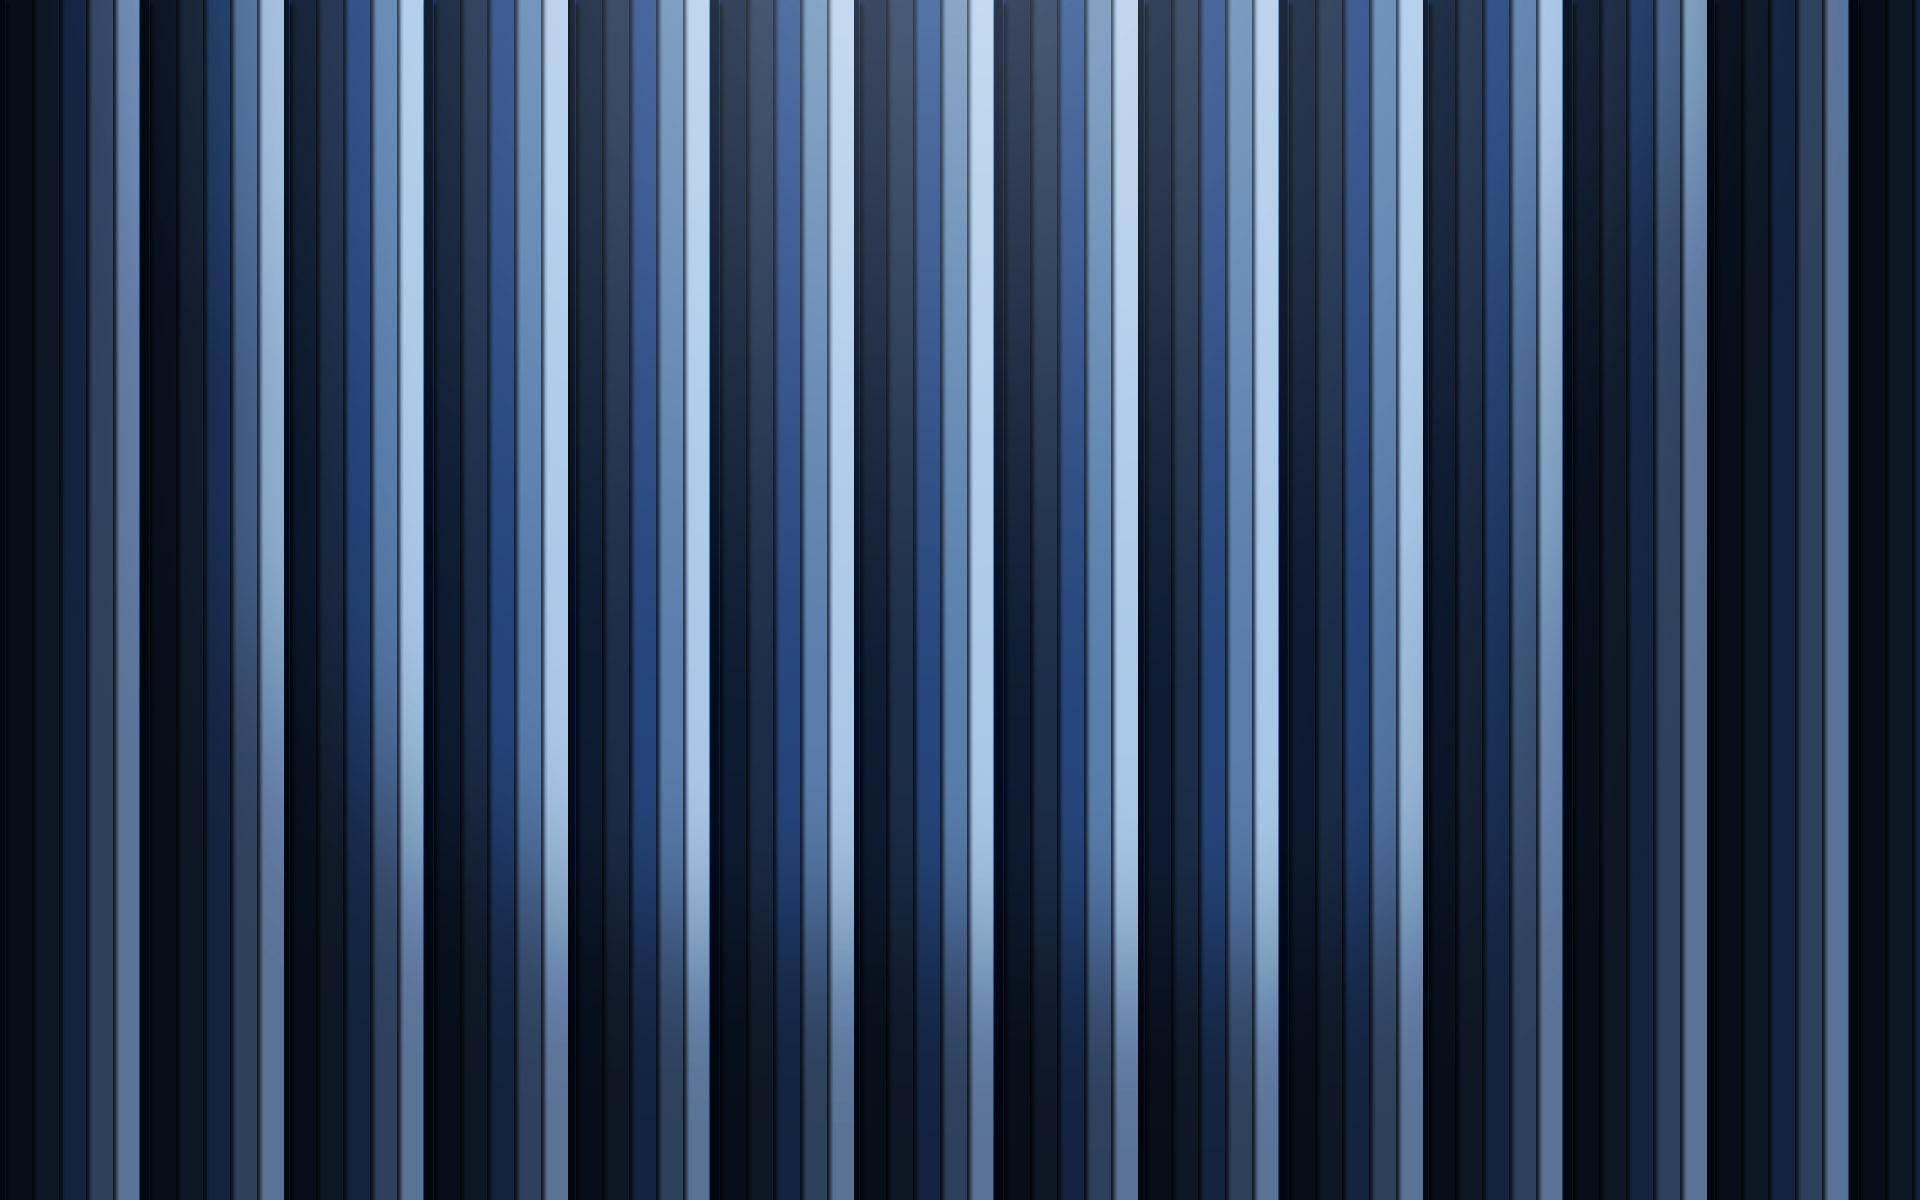 Blue Striped Wallpaper: Black Stripe Wallpaper